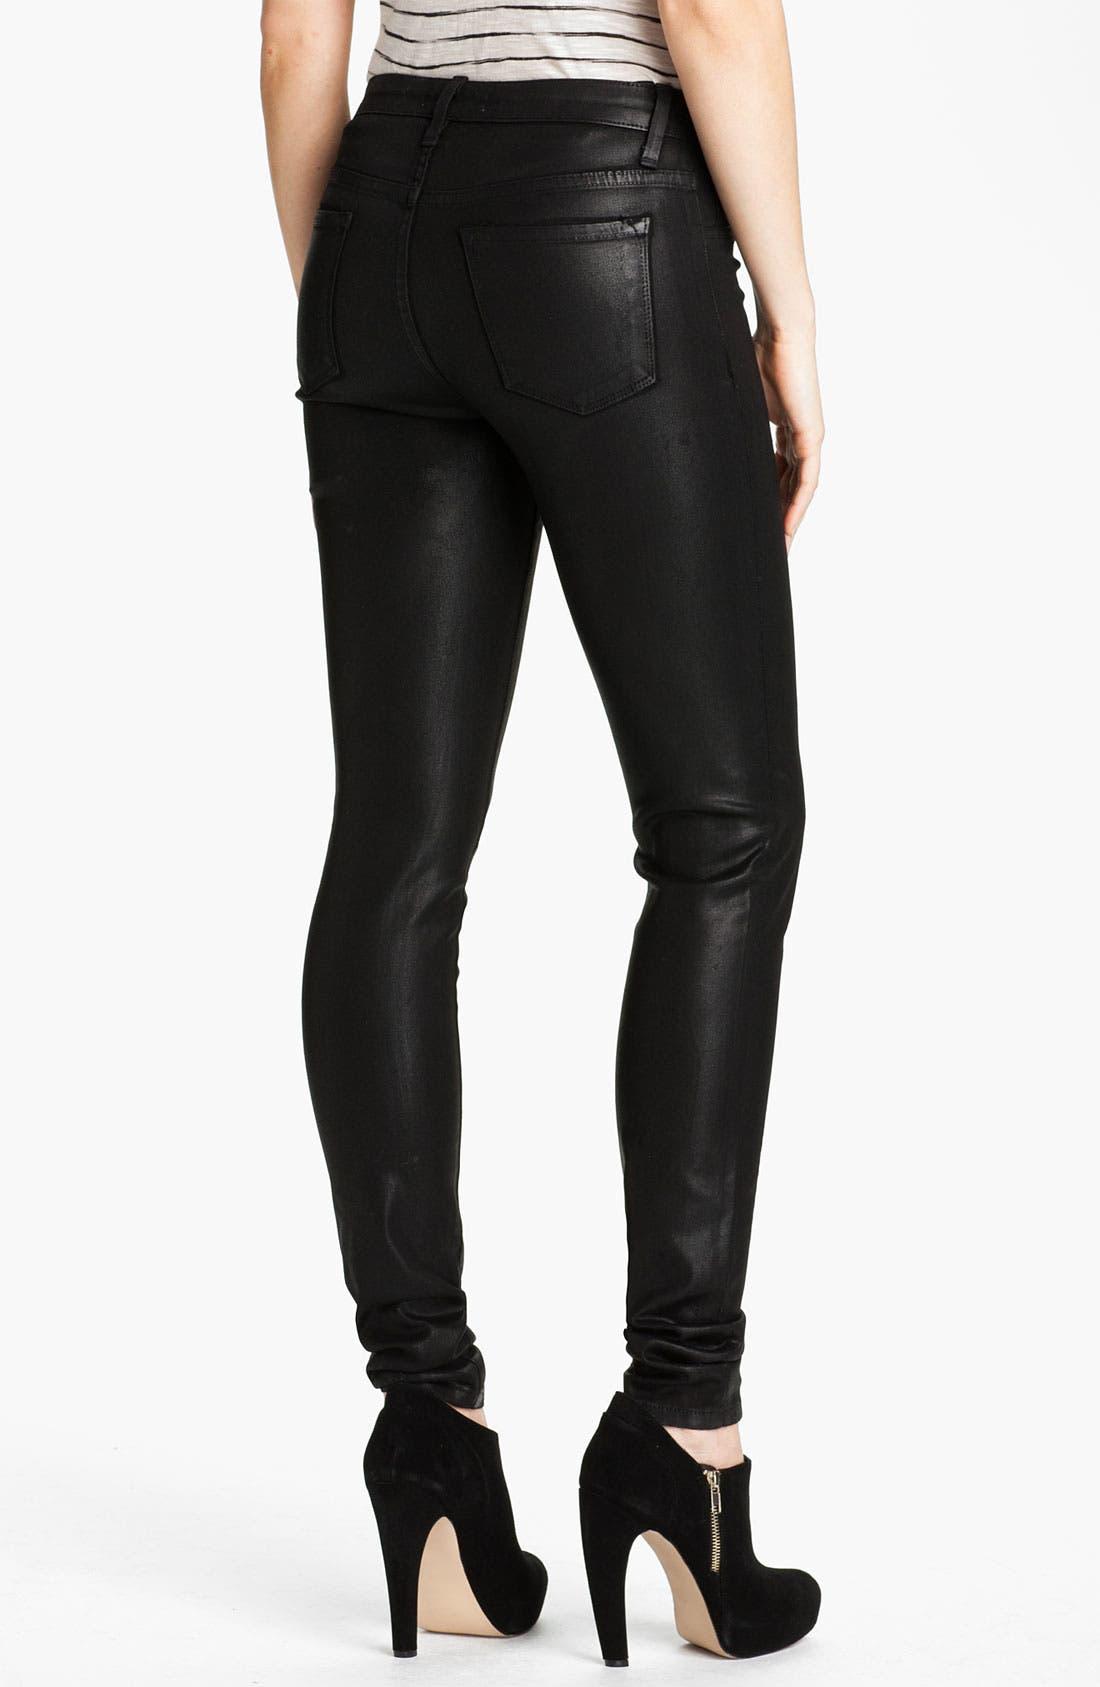 Sarah & George Coated Denim Jeans,                             Alternate thumbnail 2, color,                             Black